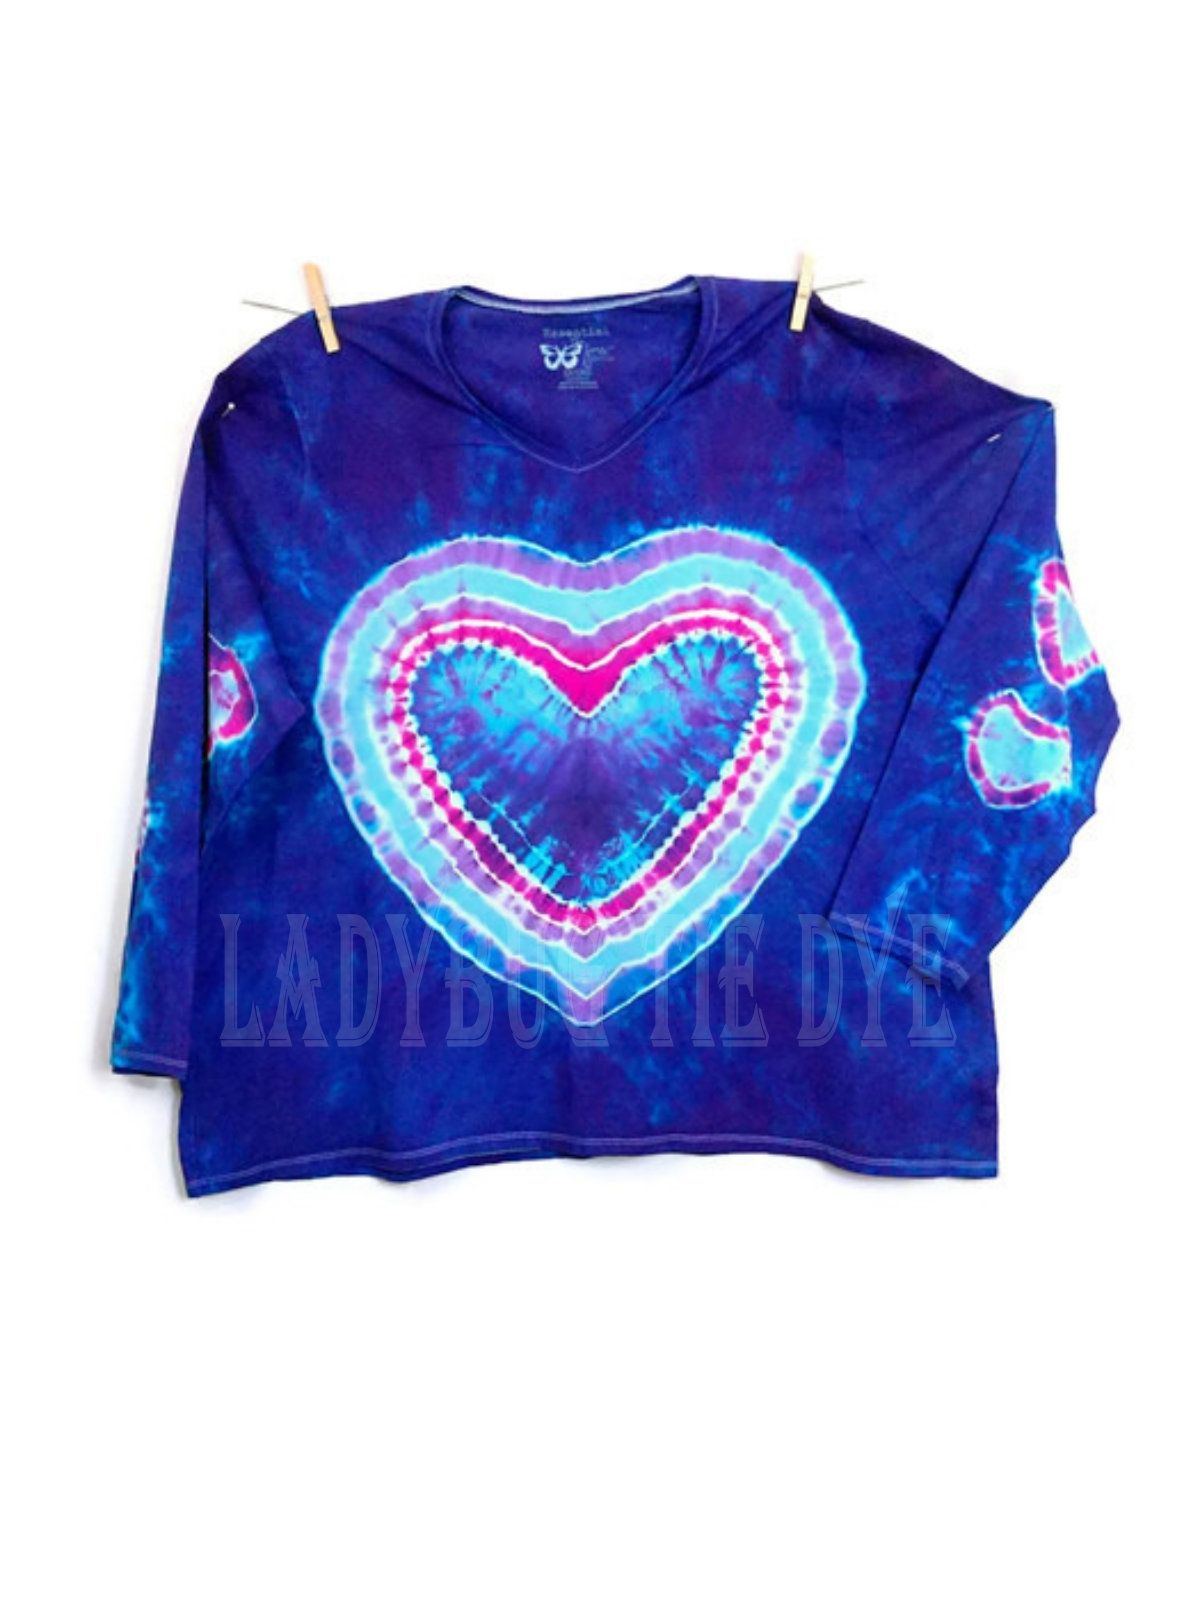 a1f1b9149 Plus Size Tie Dye Womens V-Neck Tshirt 5XLarge Long Sleeves Heart Tie Dye  Boho Hippie Top Blue And Purple 5XL Tshirt #womenslongsleeveshirt #hearts # tiedye ...